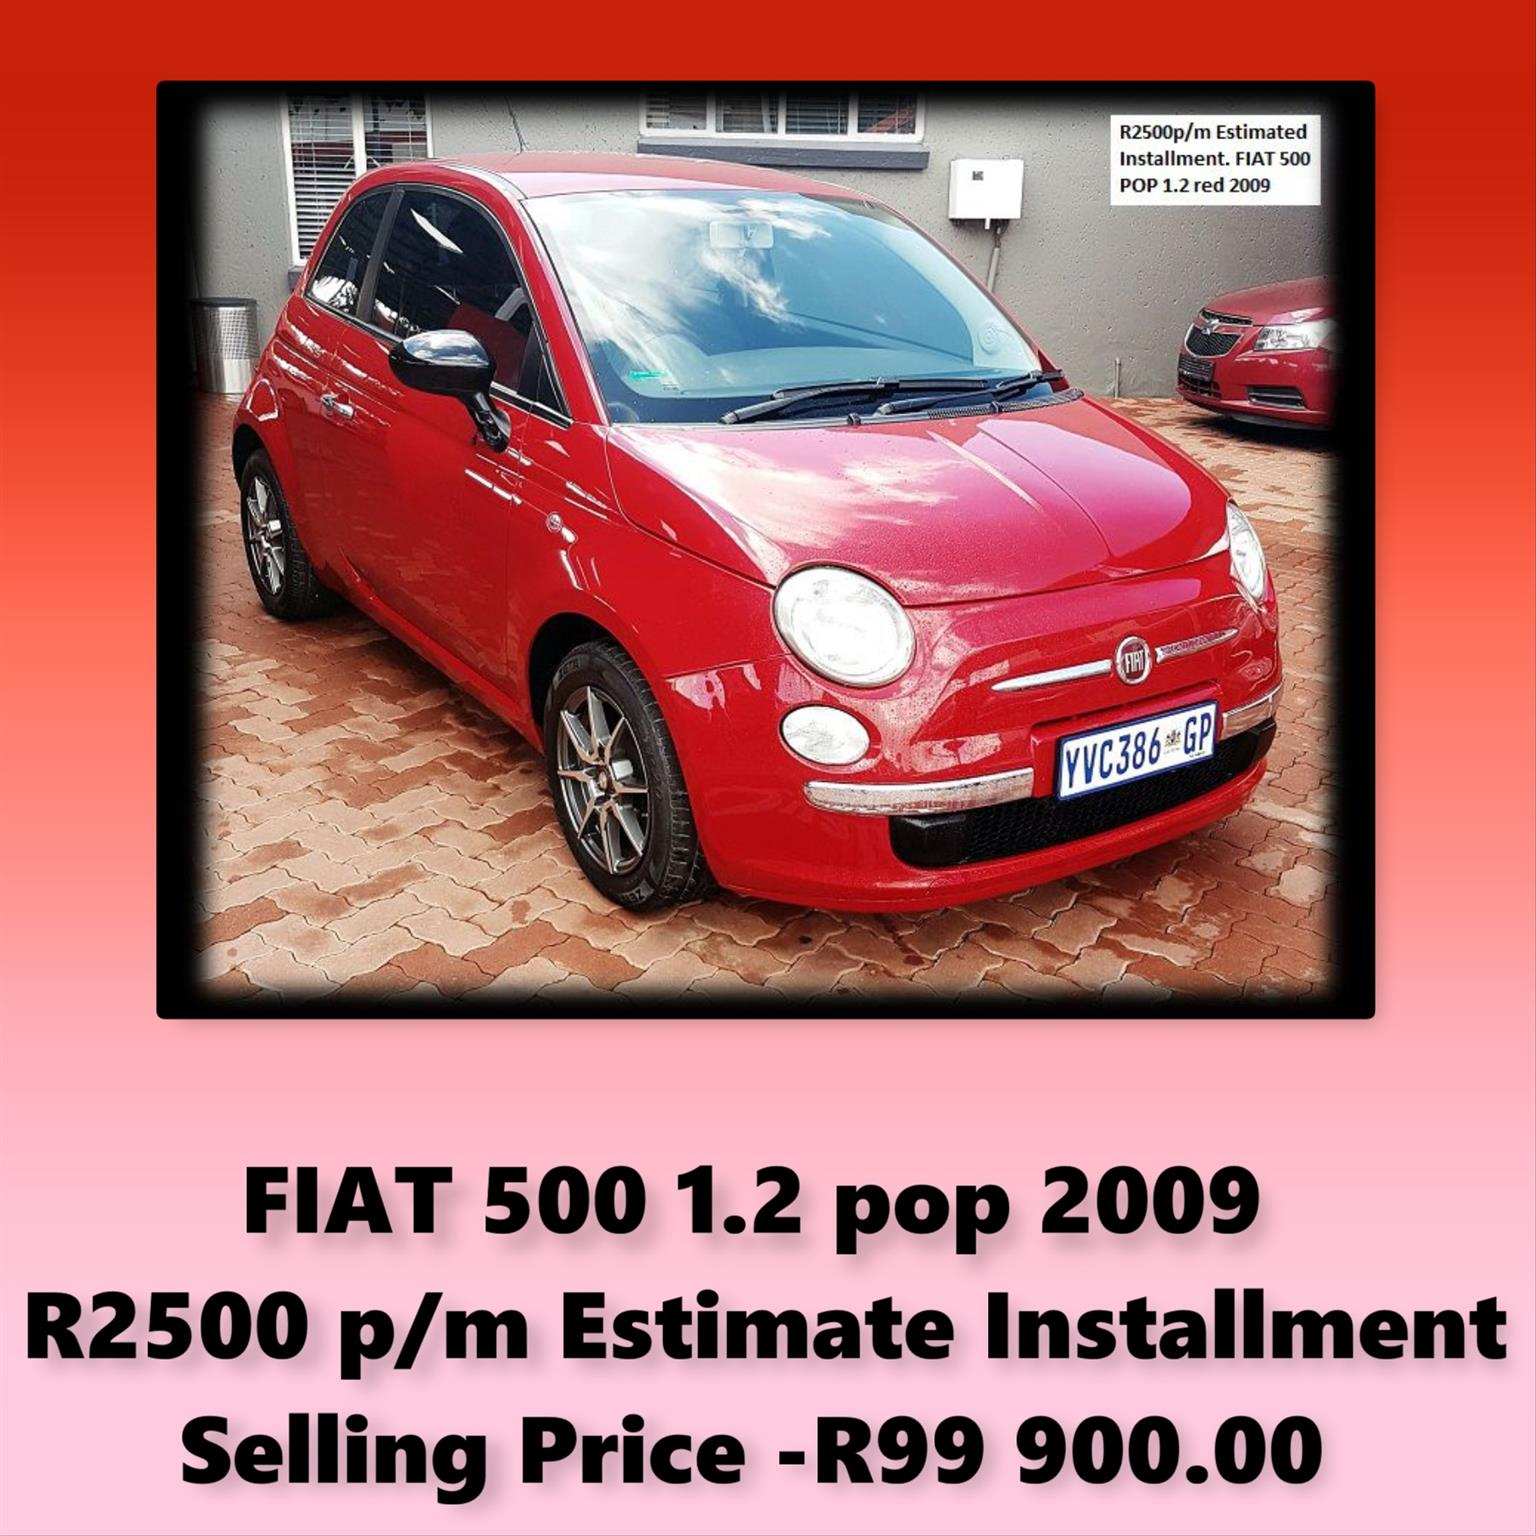 2009 Fiat 500 1.2 Pop